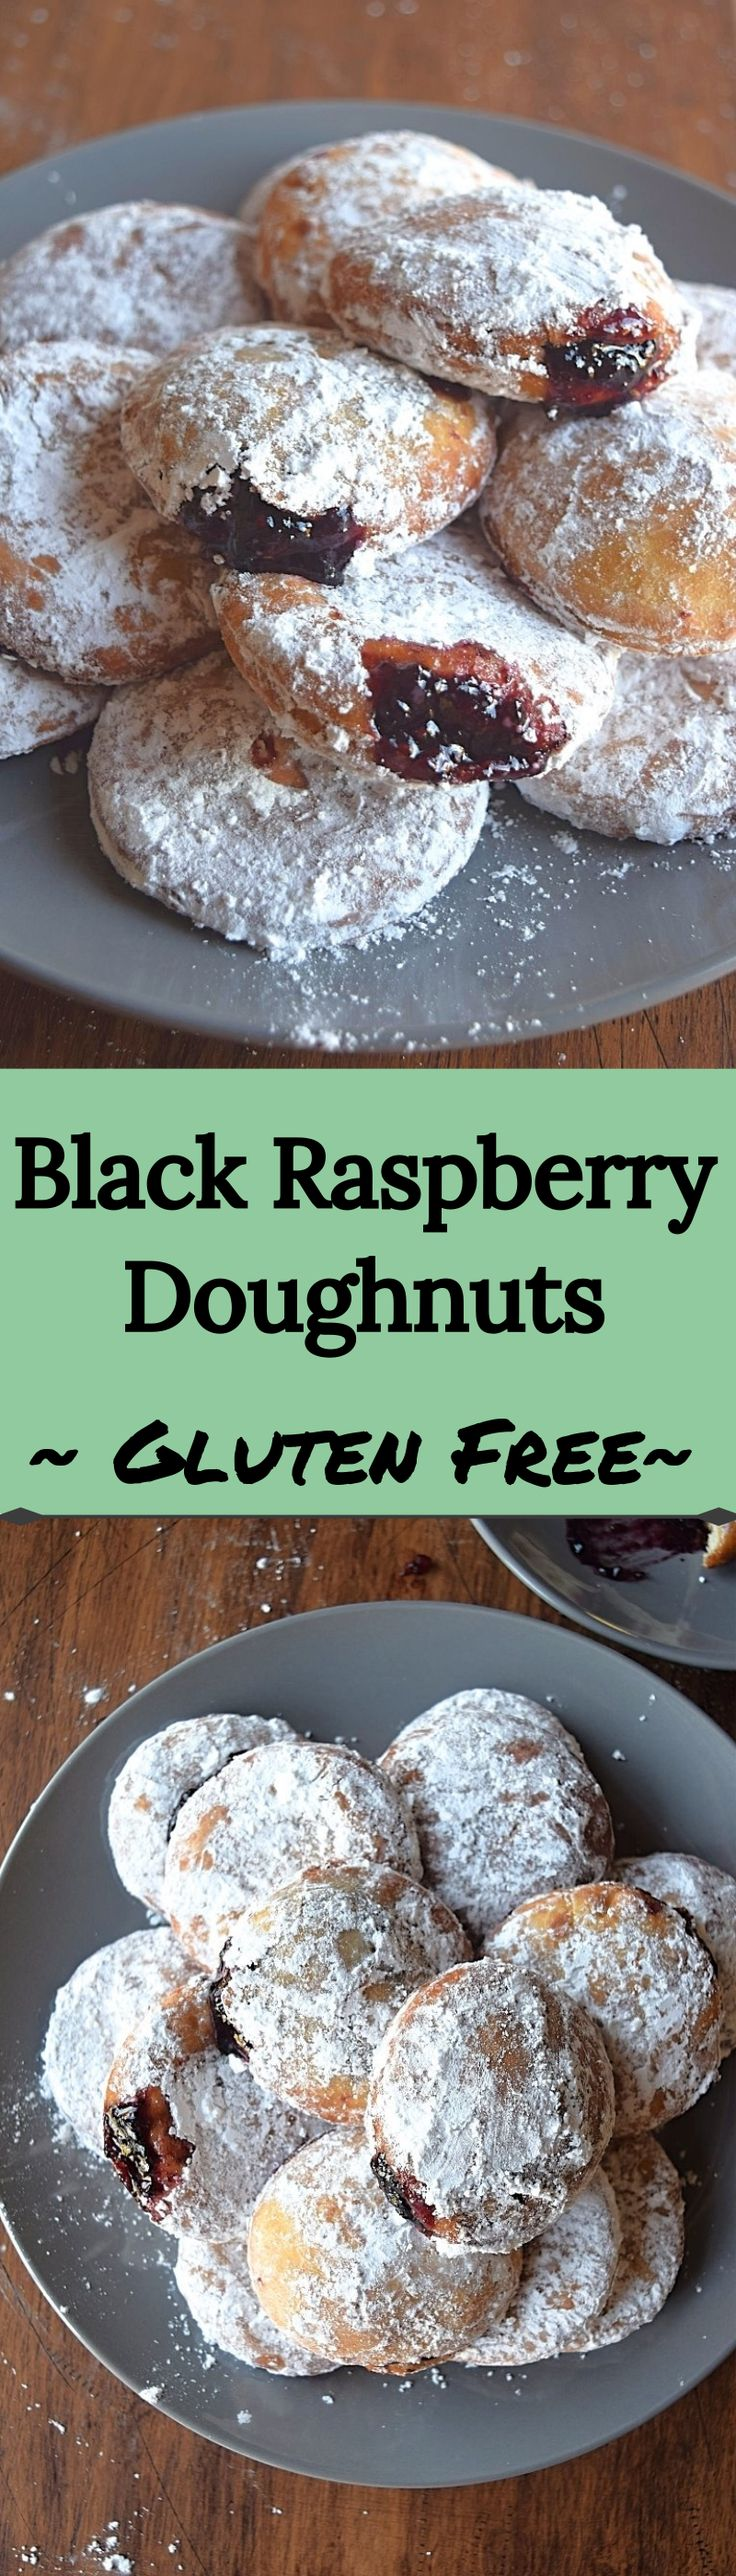 Black Raspberry Jelly Doughnuts – A Stray Kitchen